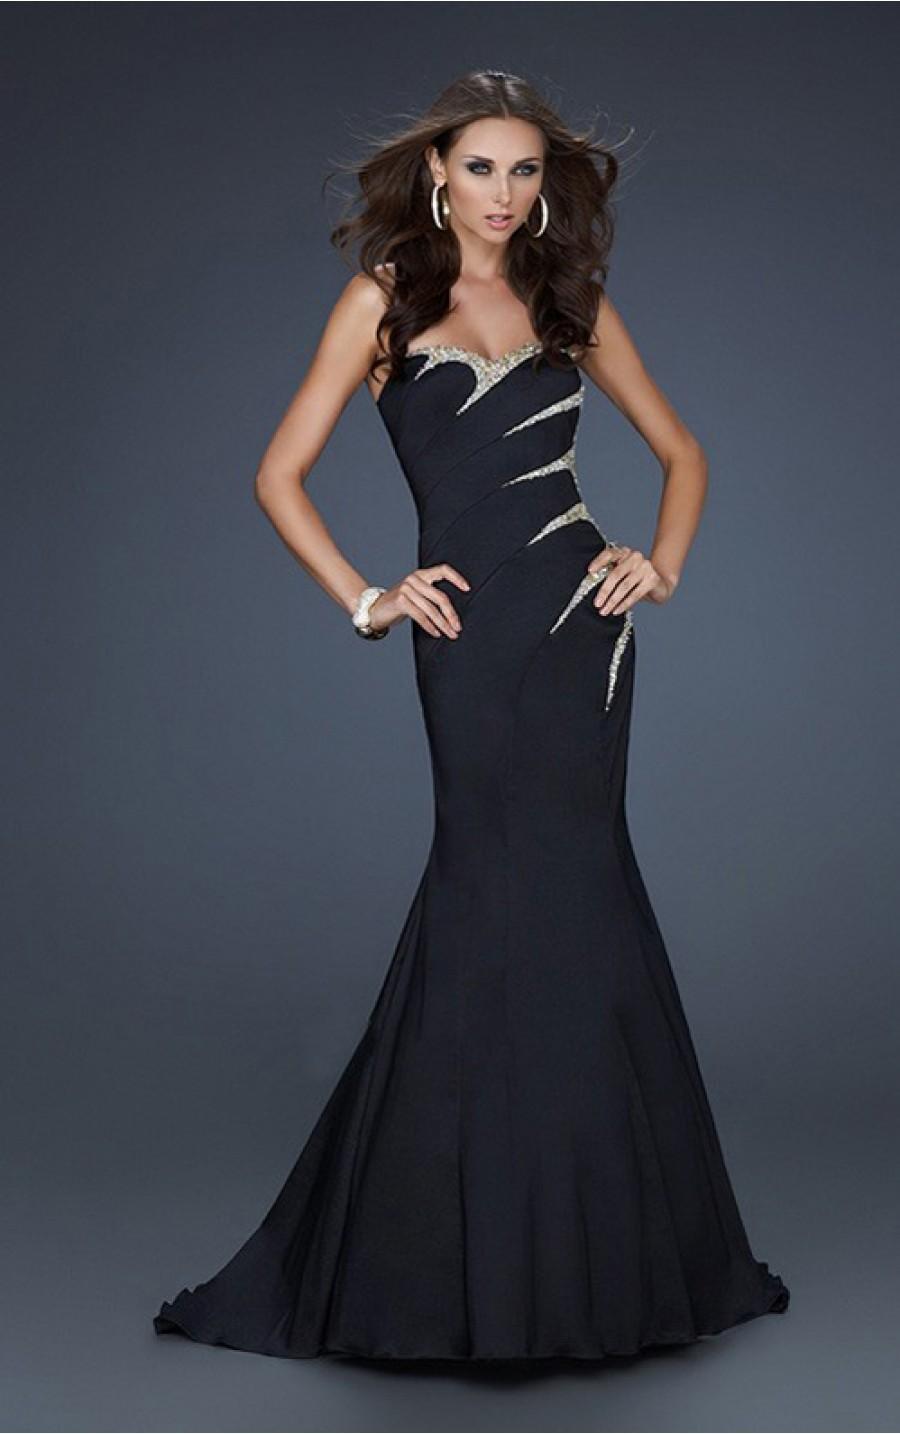 Simple Black Strapless Dress Cocktail Dresses 2016